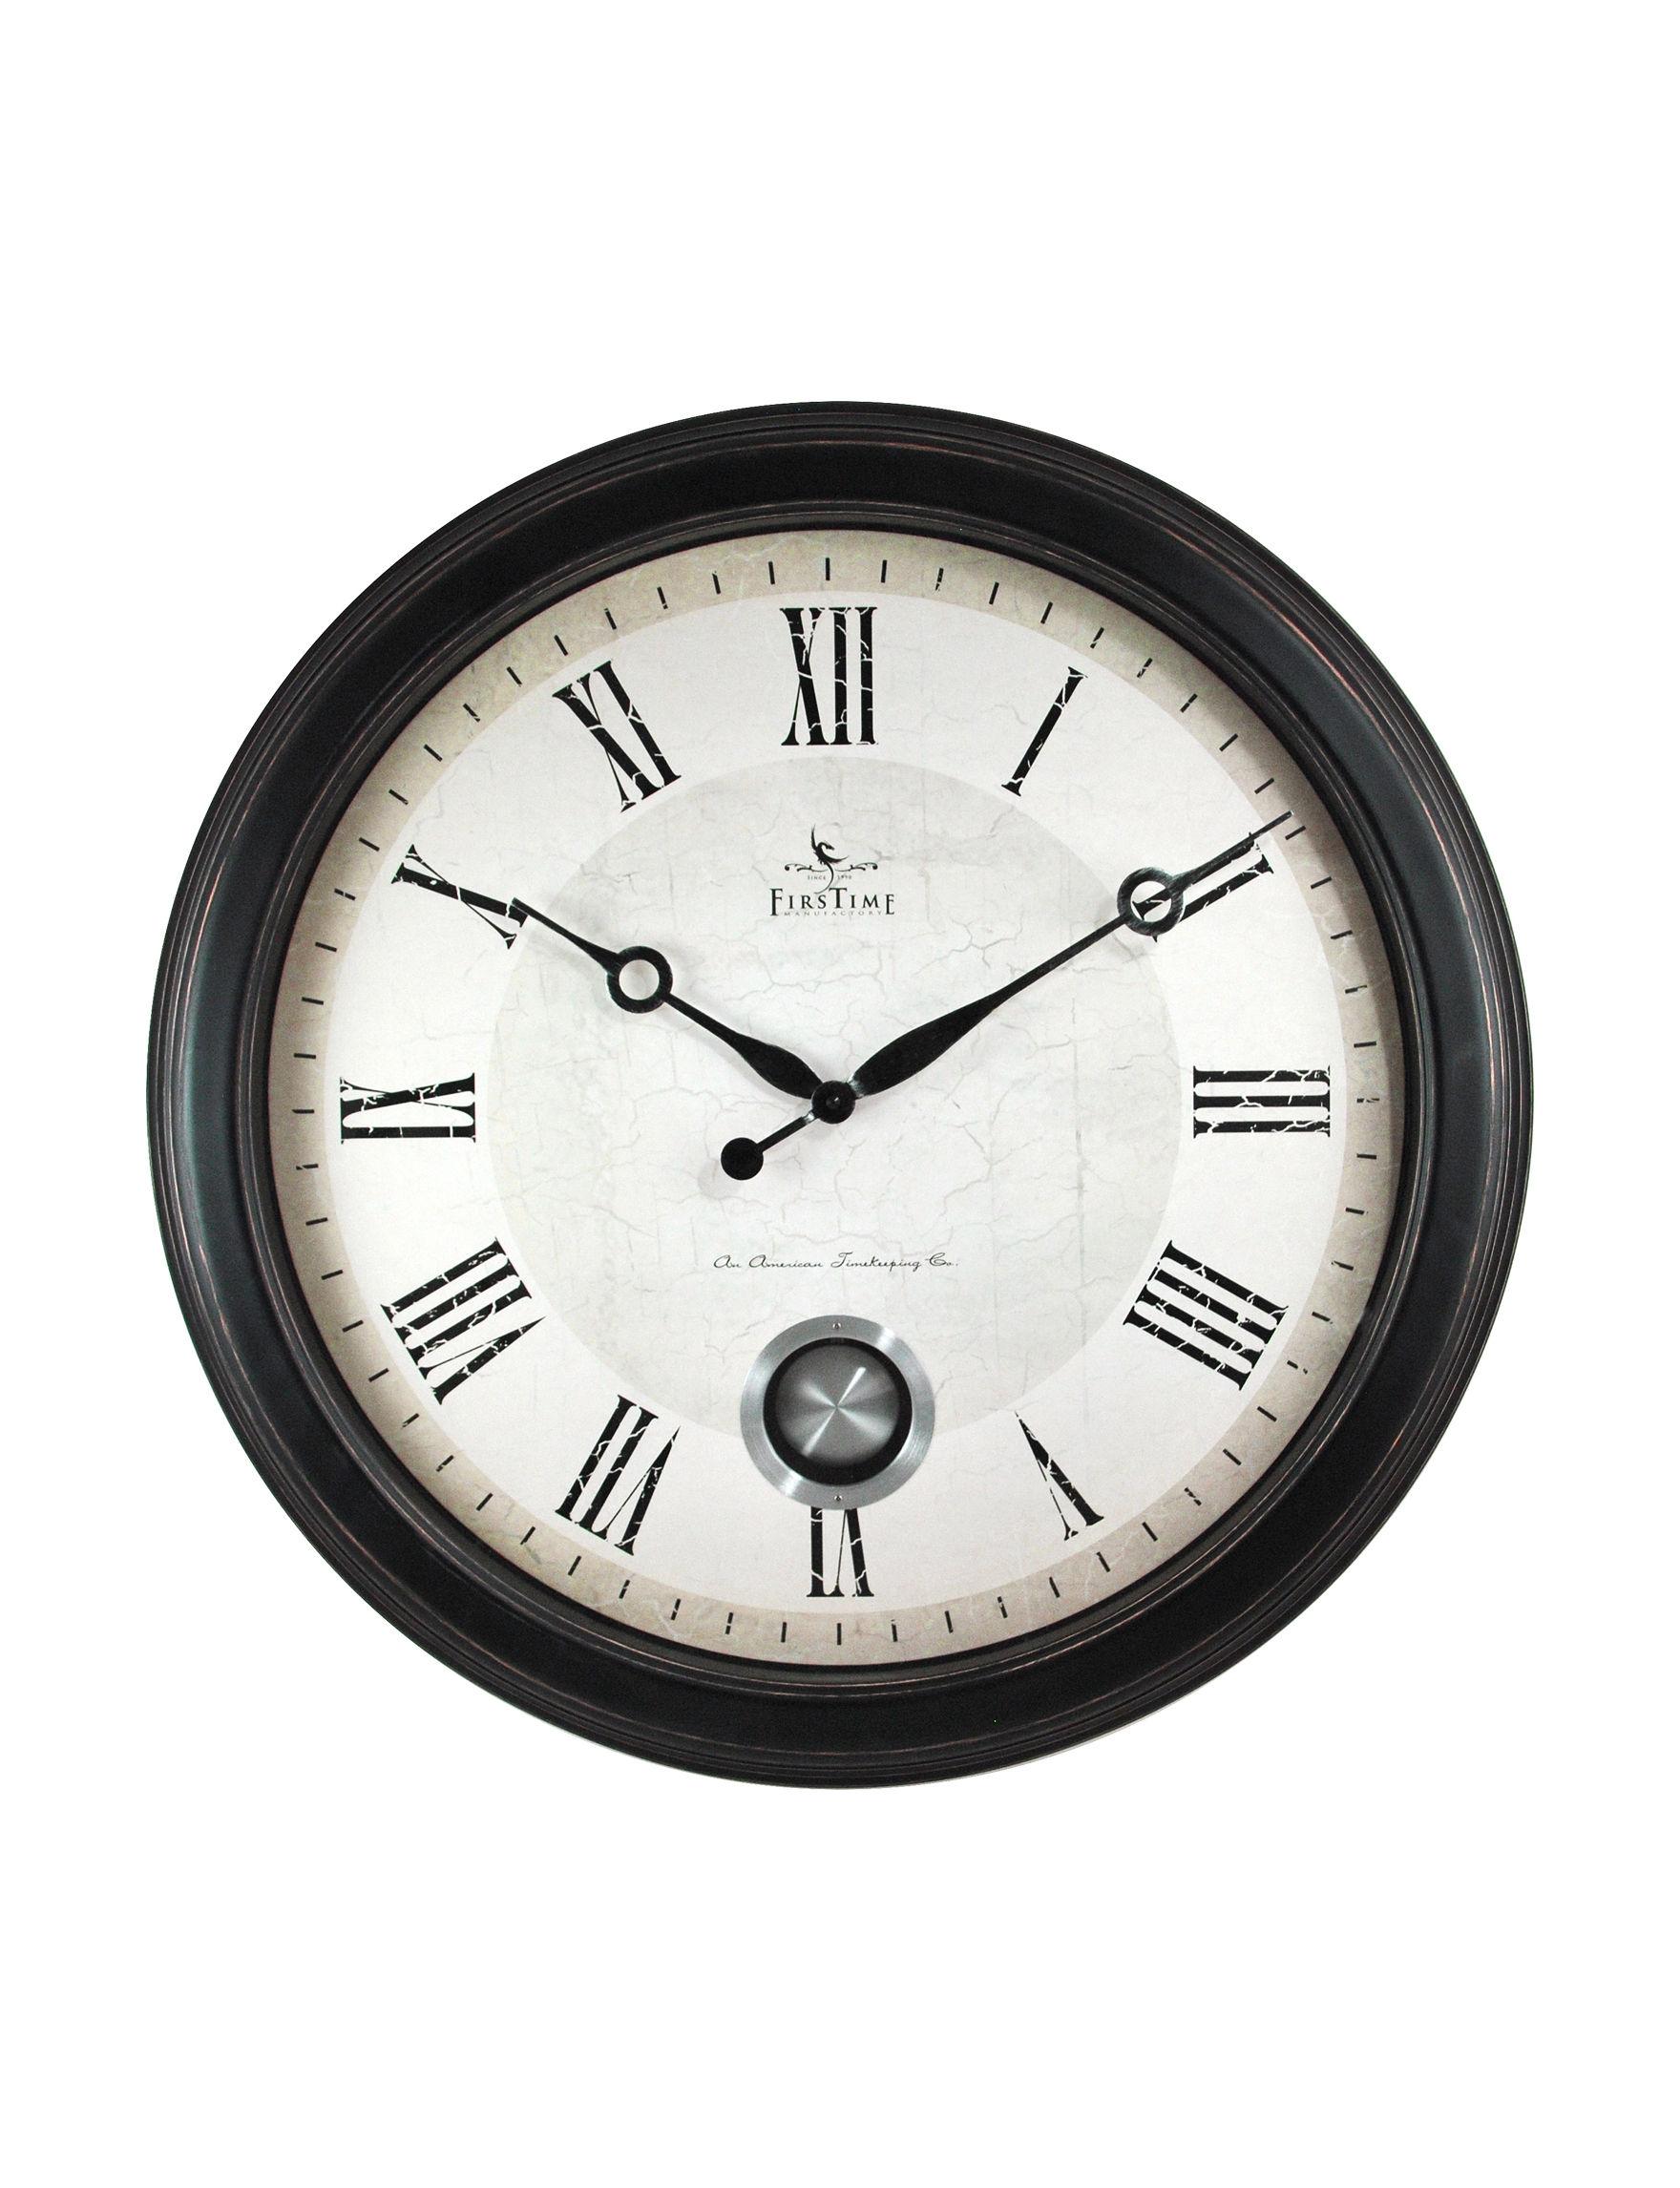 Firstime Manufactory  Desk Clocks Wall Decor